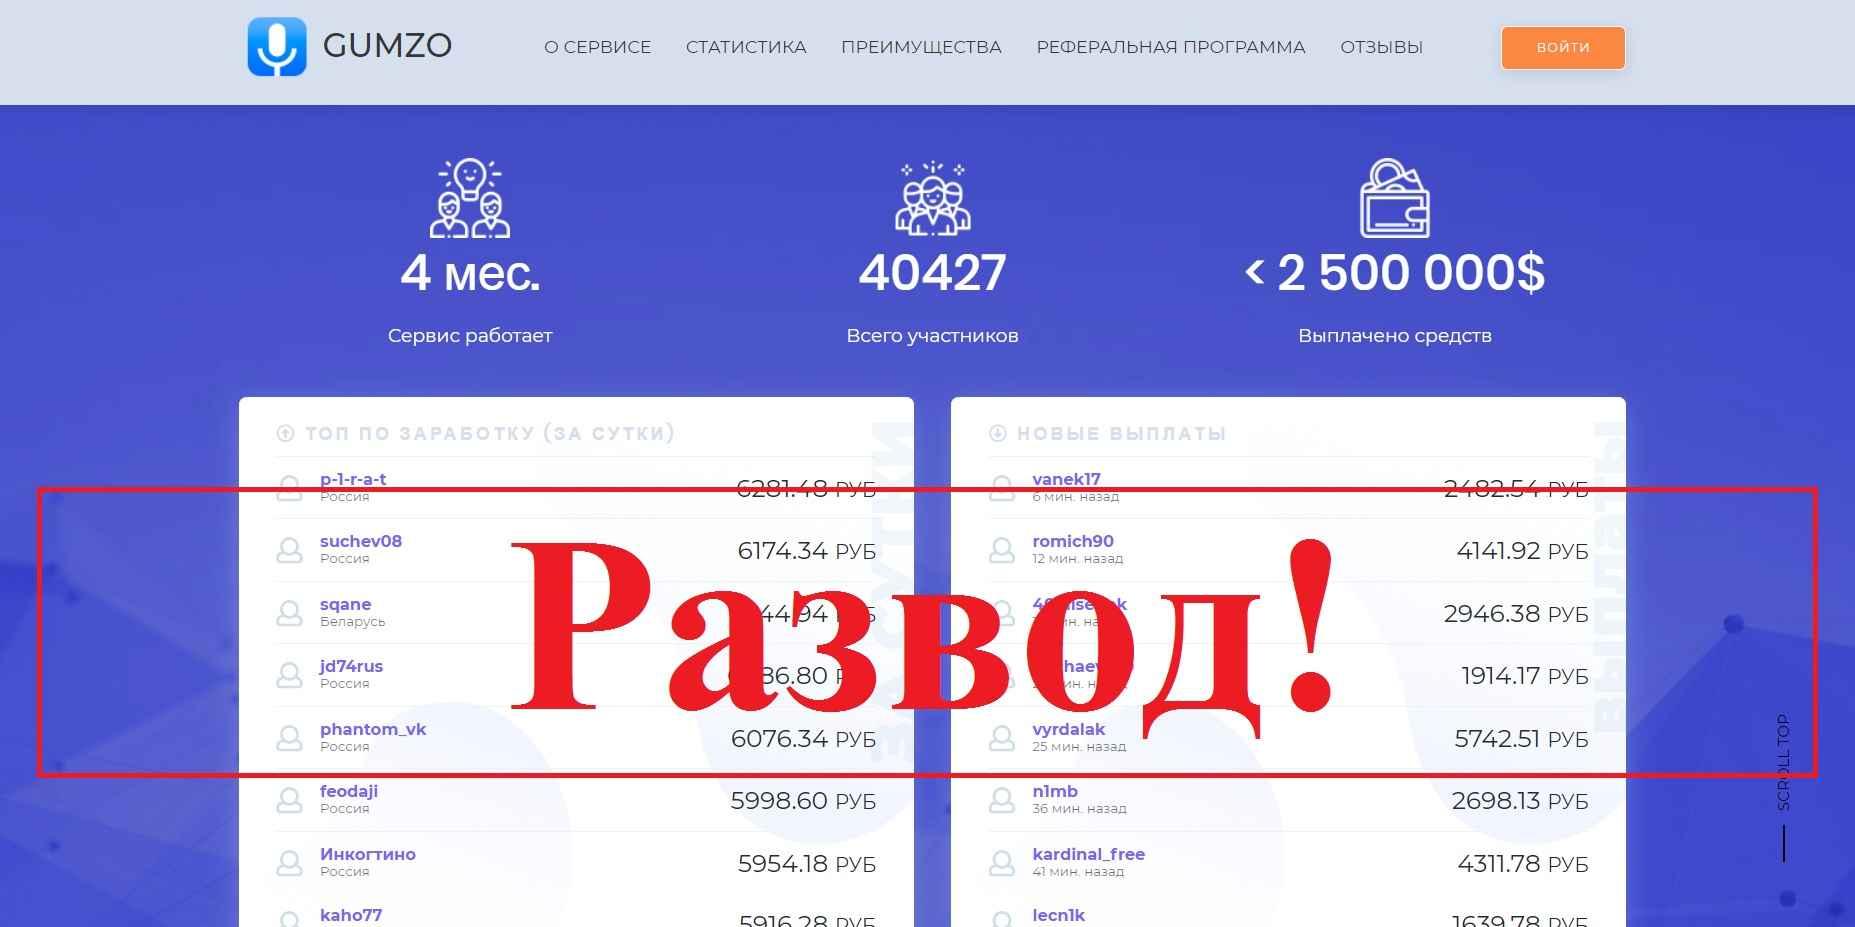 Gumzo – заработок в интернете. Отзывы о gumzo.ru